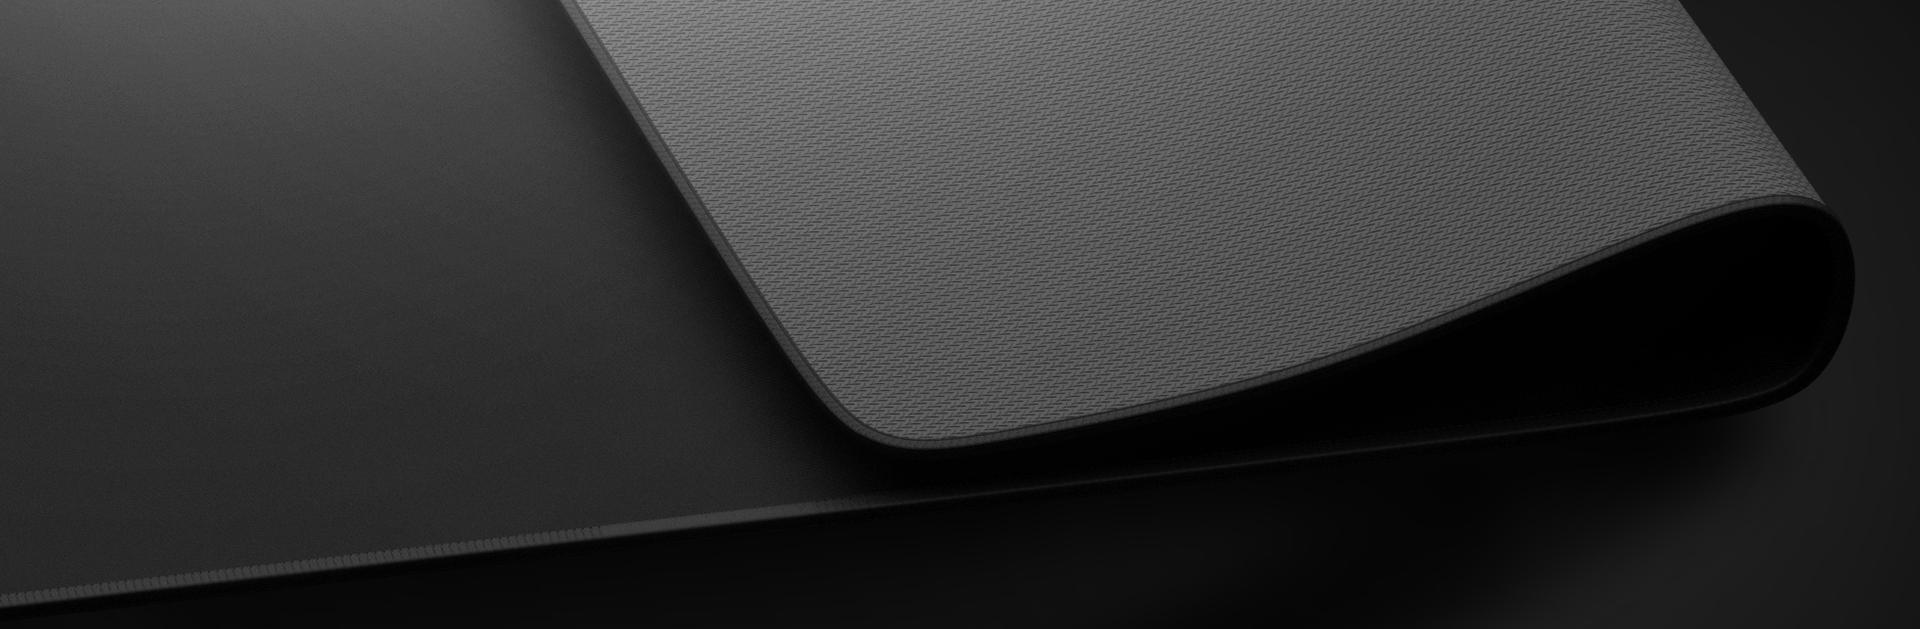 mouse pad genesis carbon 700 cordura xl 450 x 400 mm 4